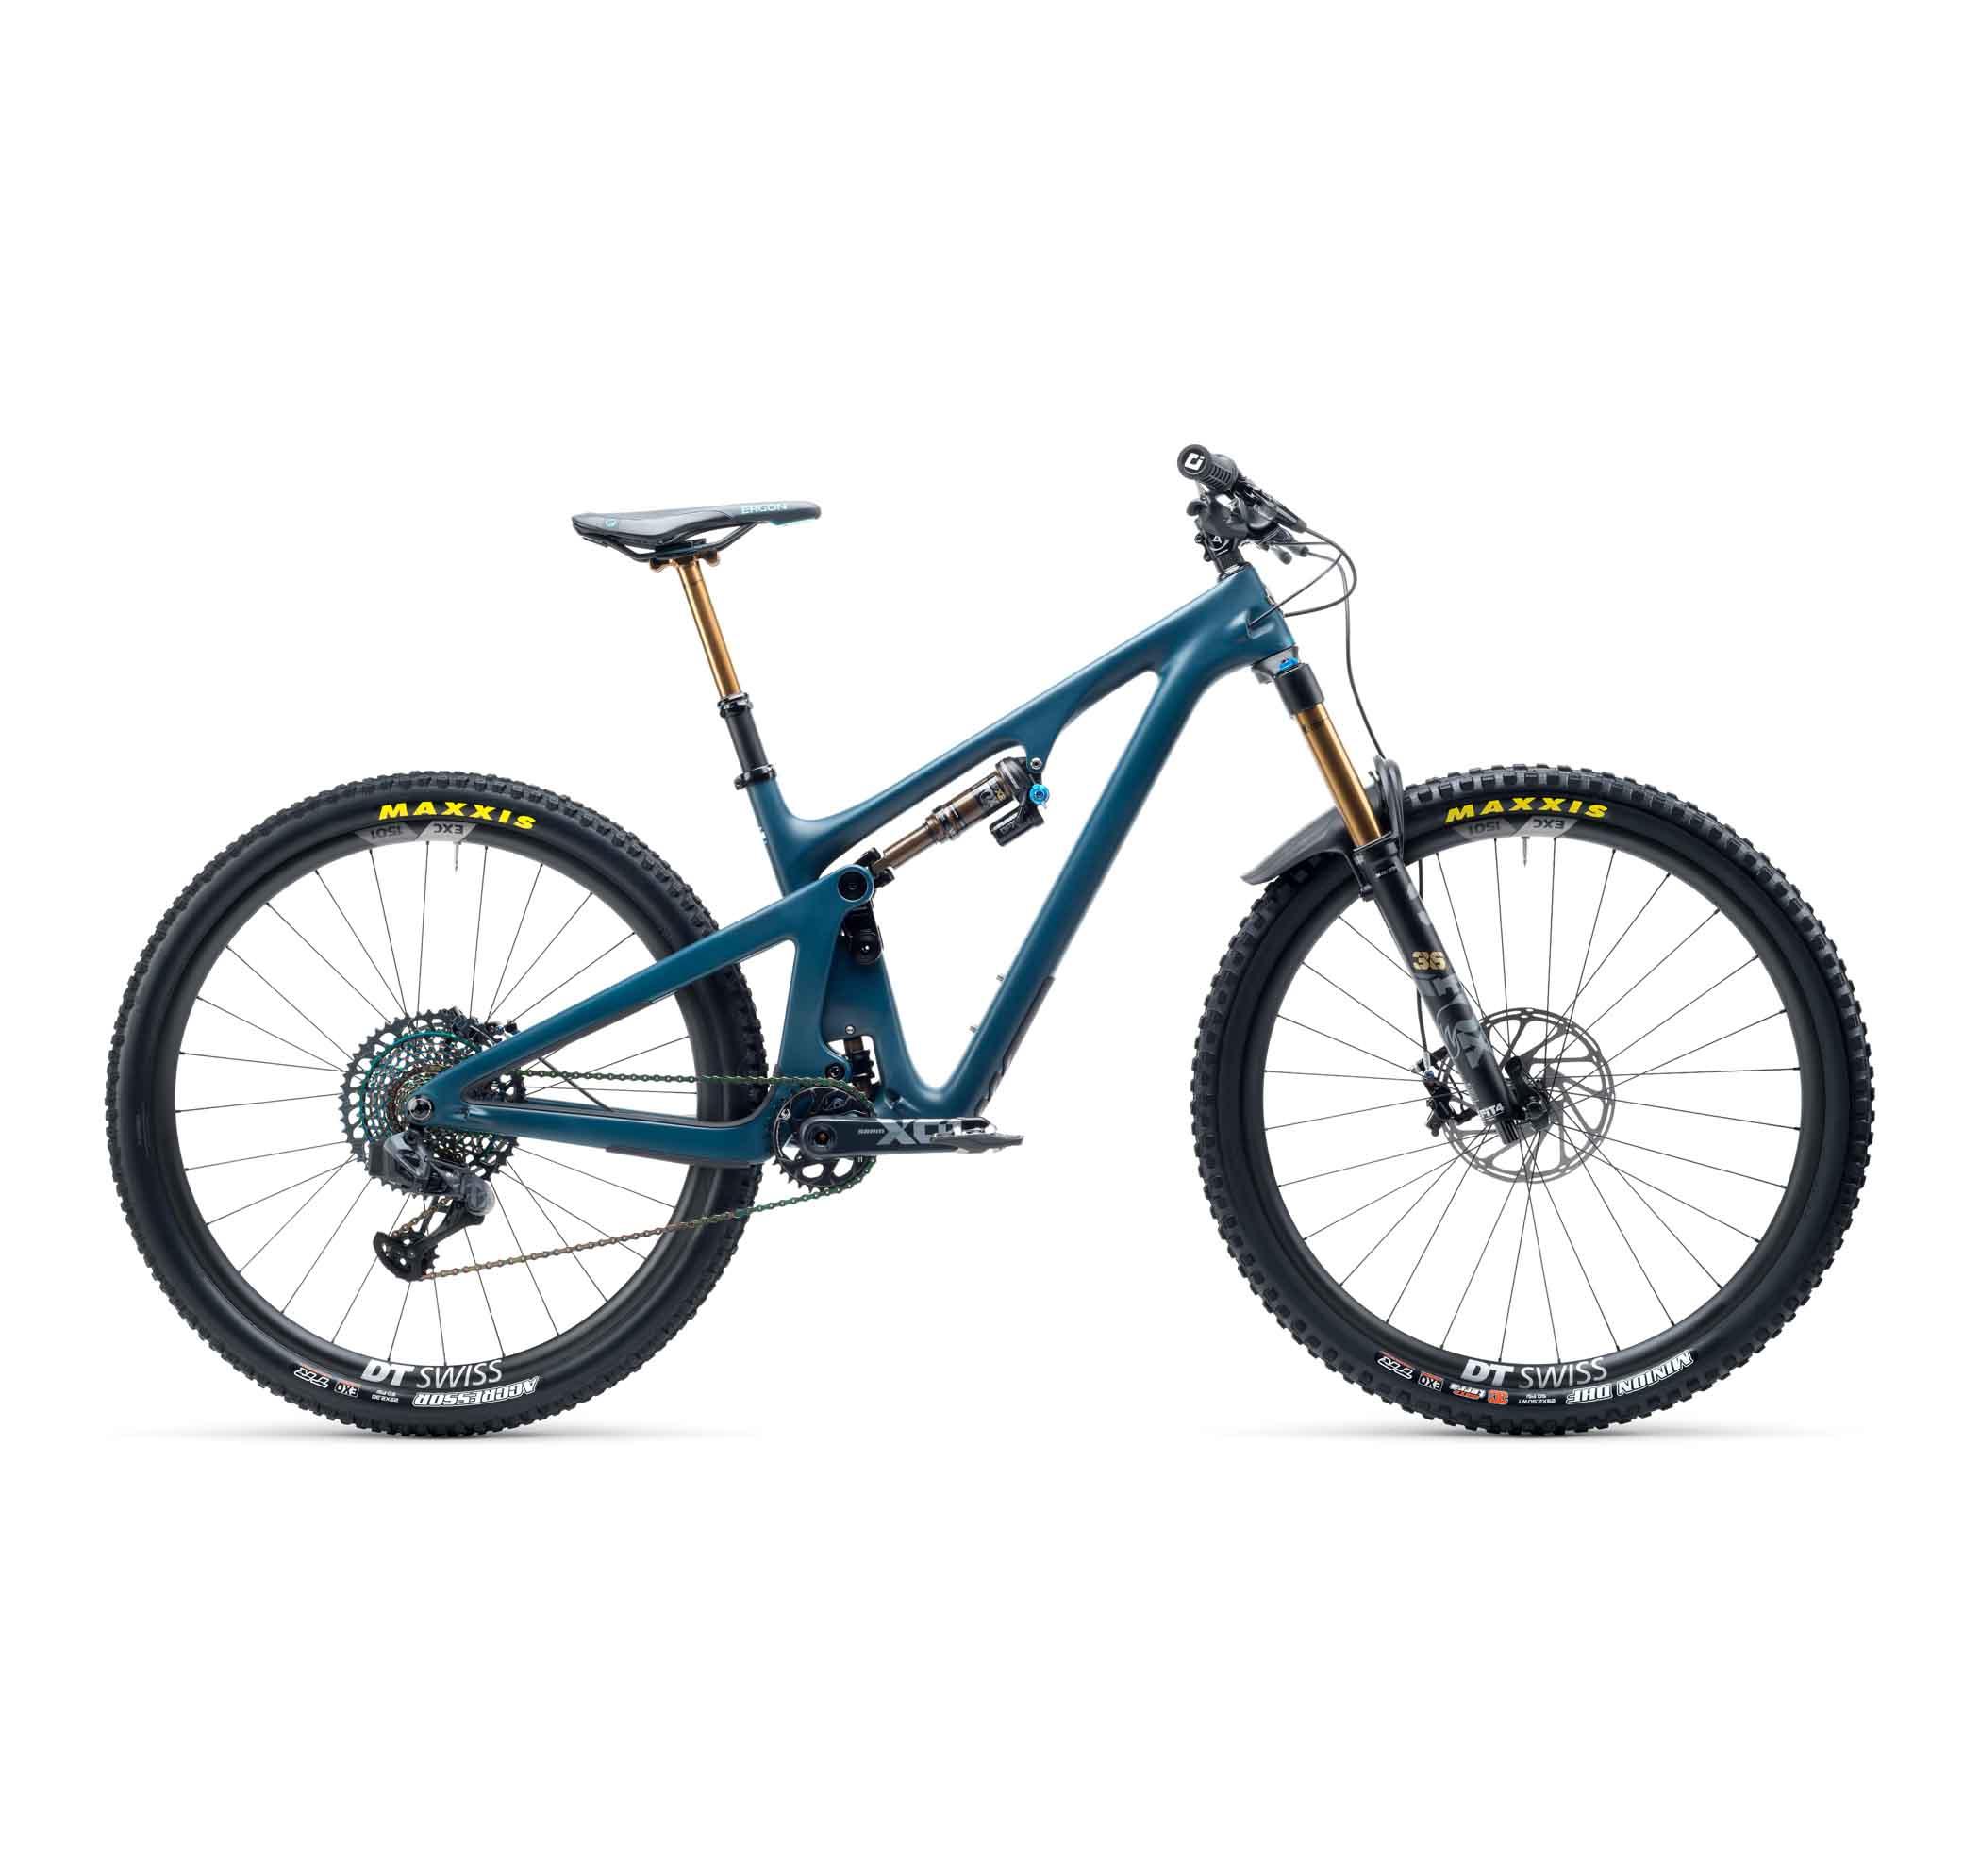 Yeti_Cycles_Rodeo_Bike_SB130_Storm